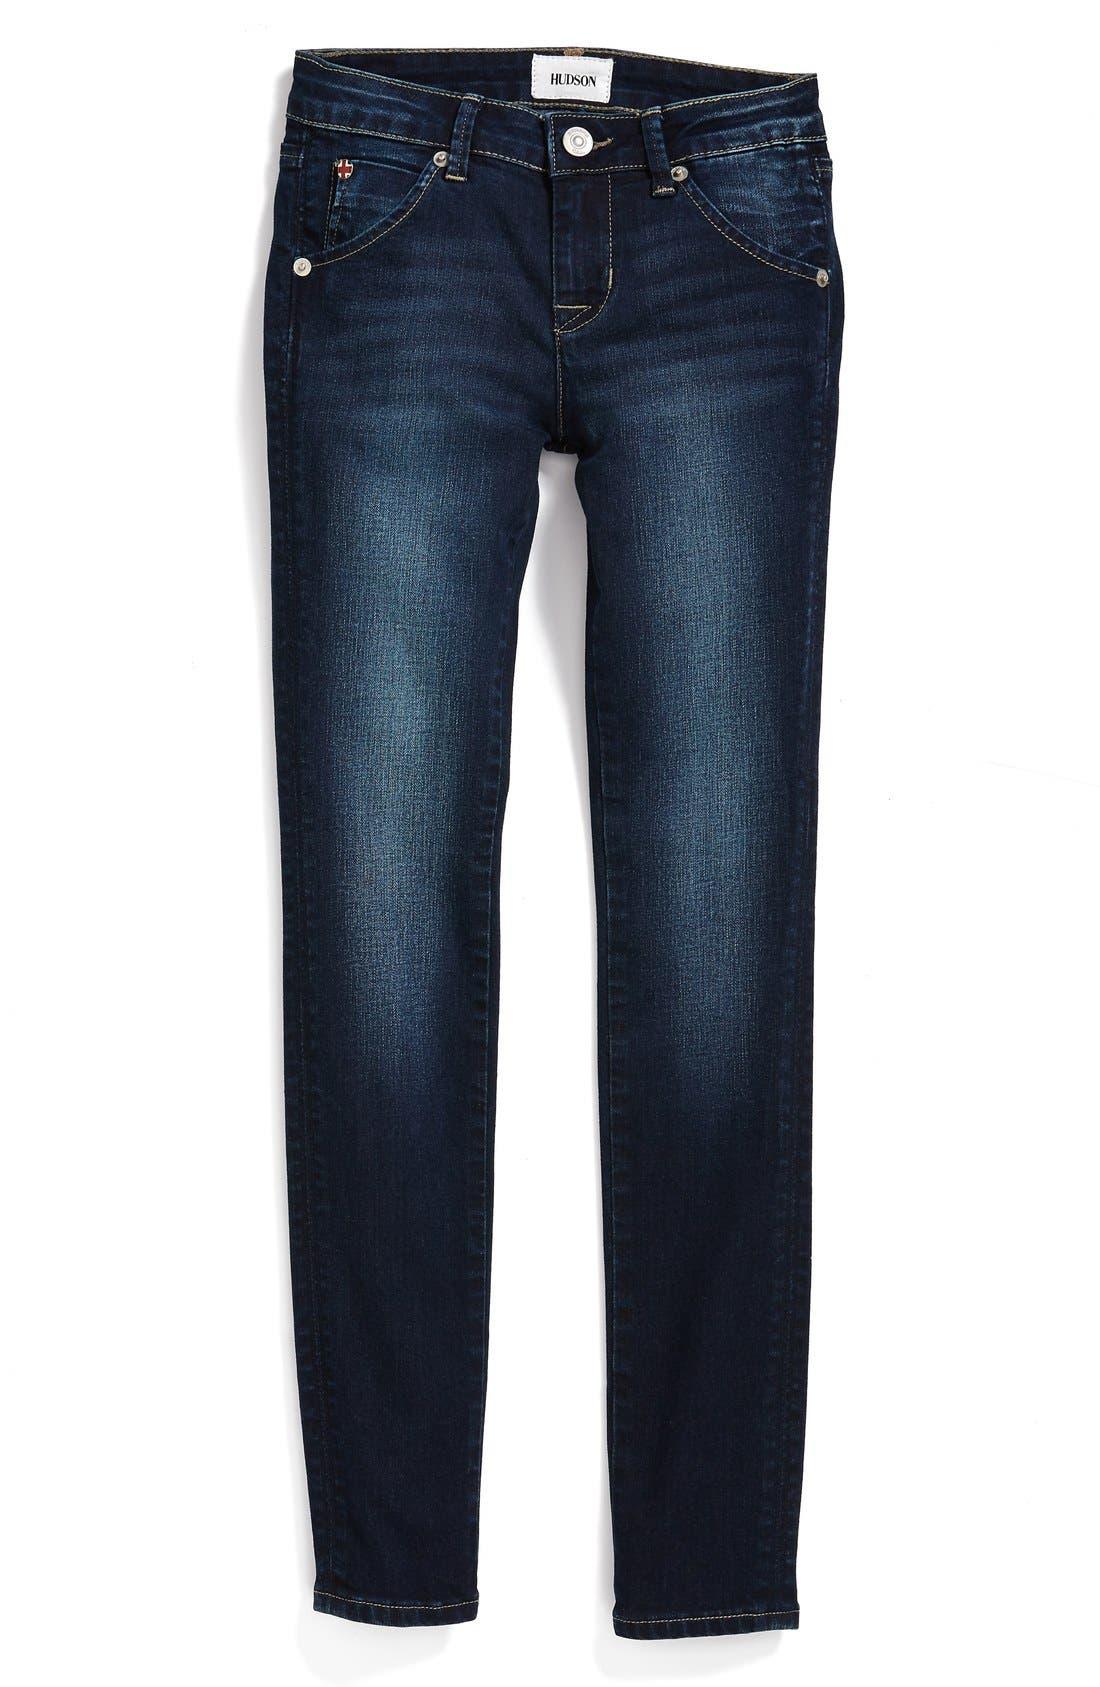 Main Image - Hudson Kids 'Collin' Flap Pocket Skinny Jeans (Big Girls)